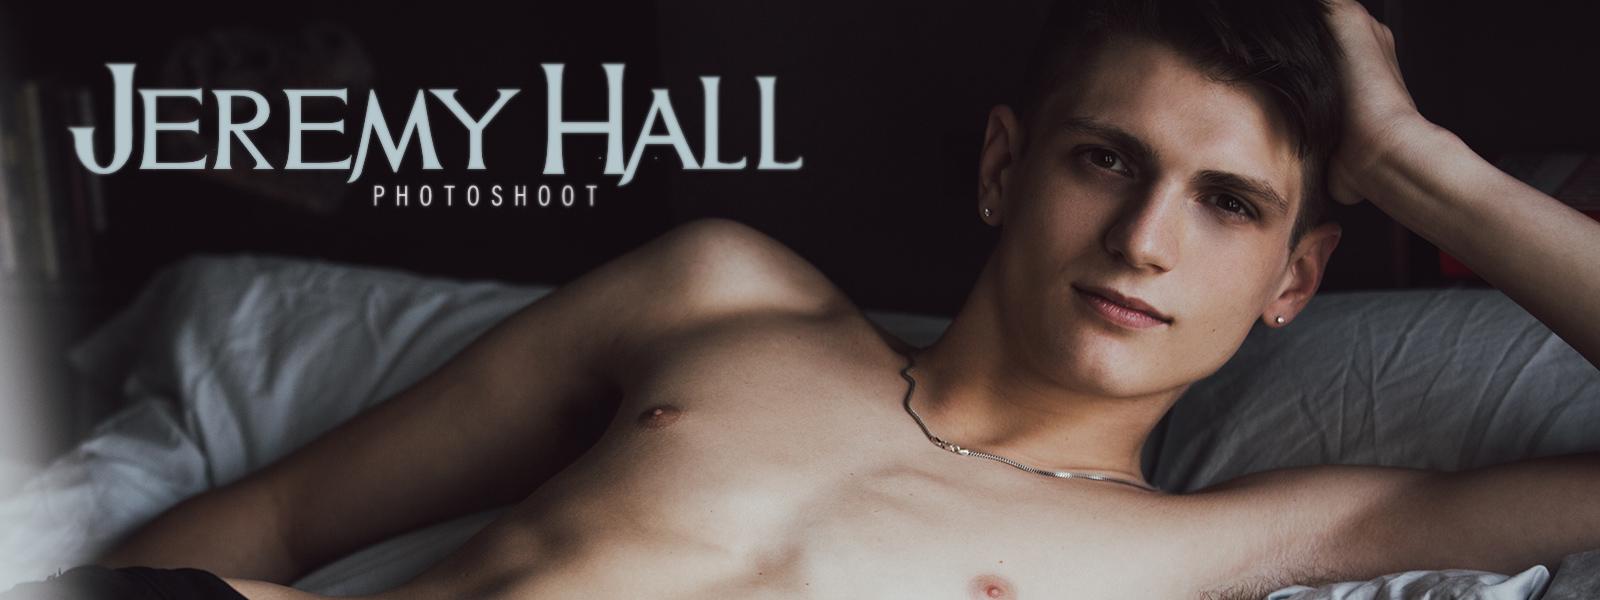 Jeremy Hall Photoshoot